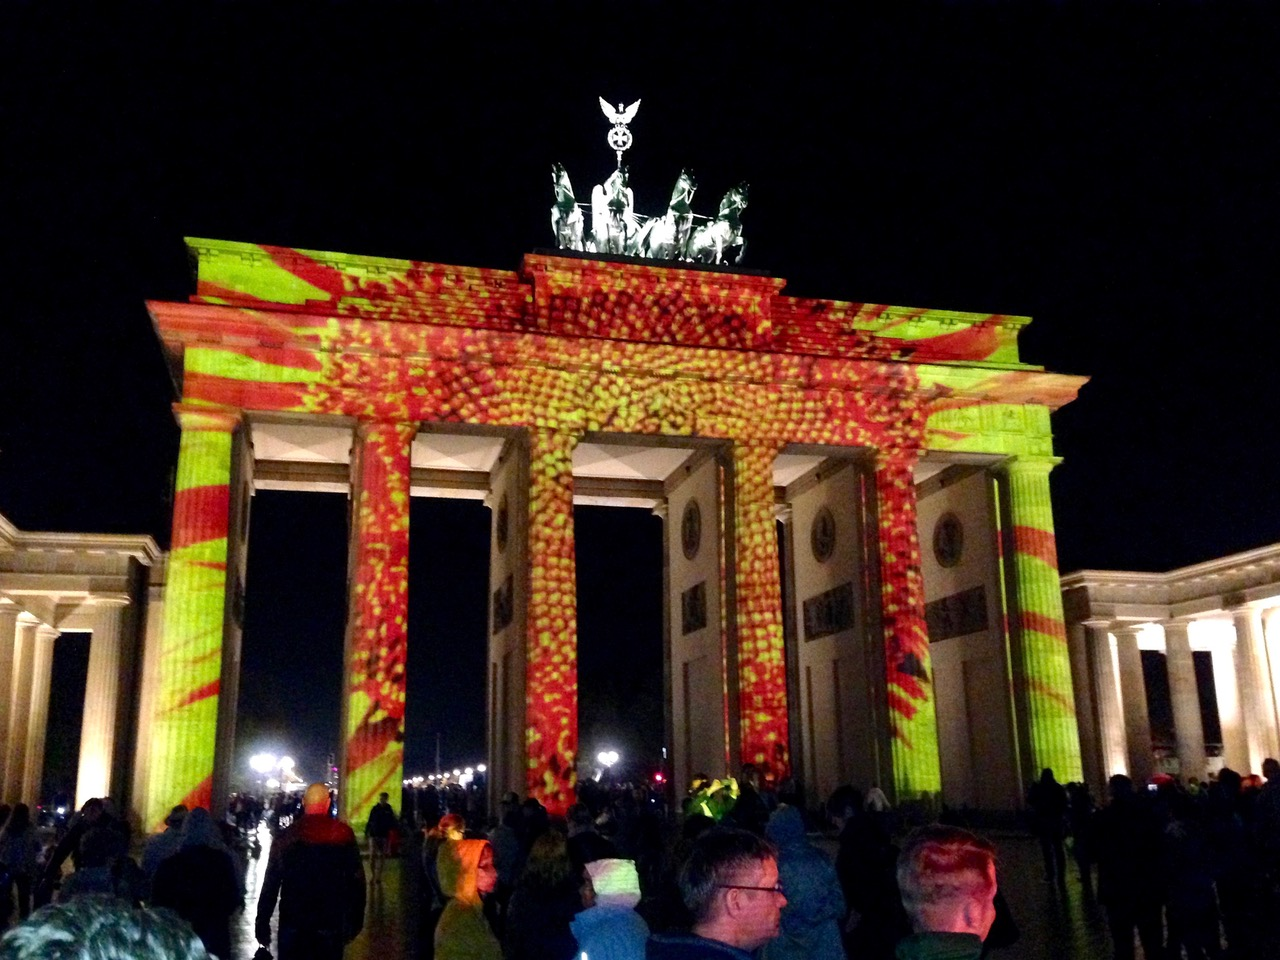 Spectacular light projections on Brandenburg Gate, Brandenburger Tor in Berlin, Germany